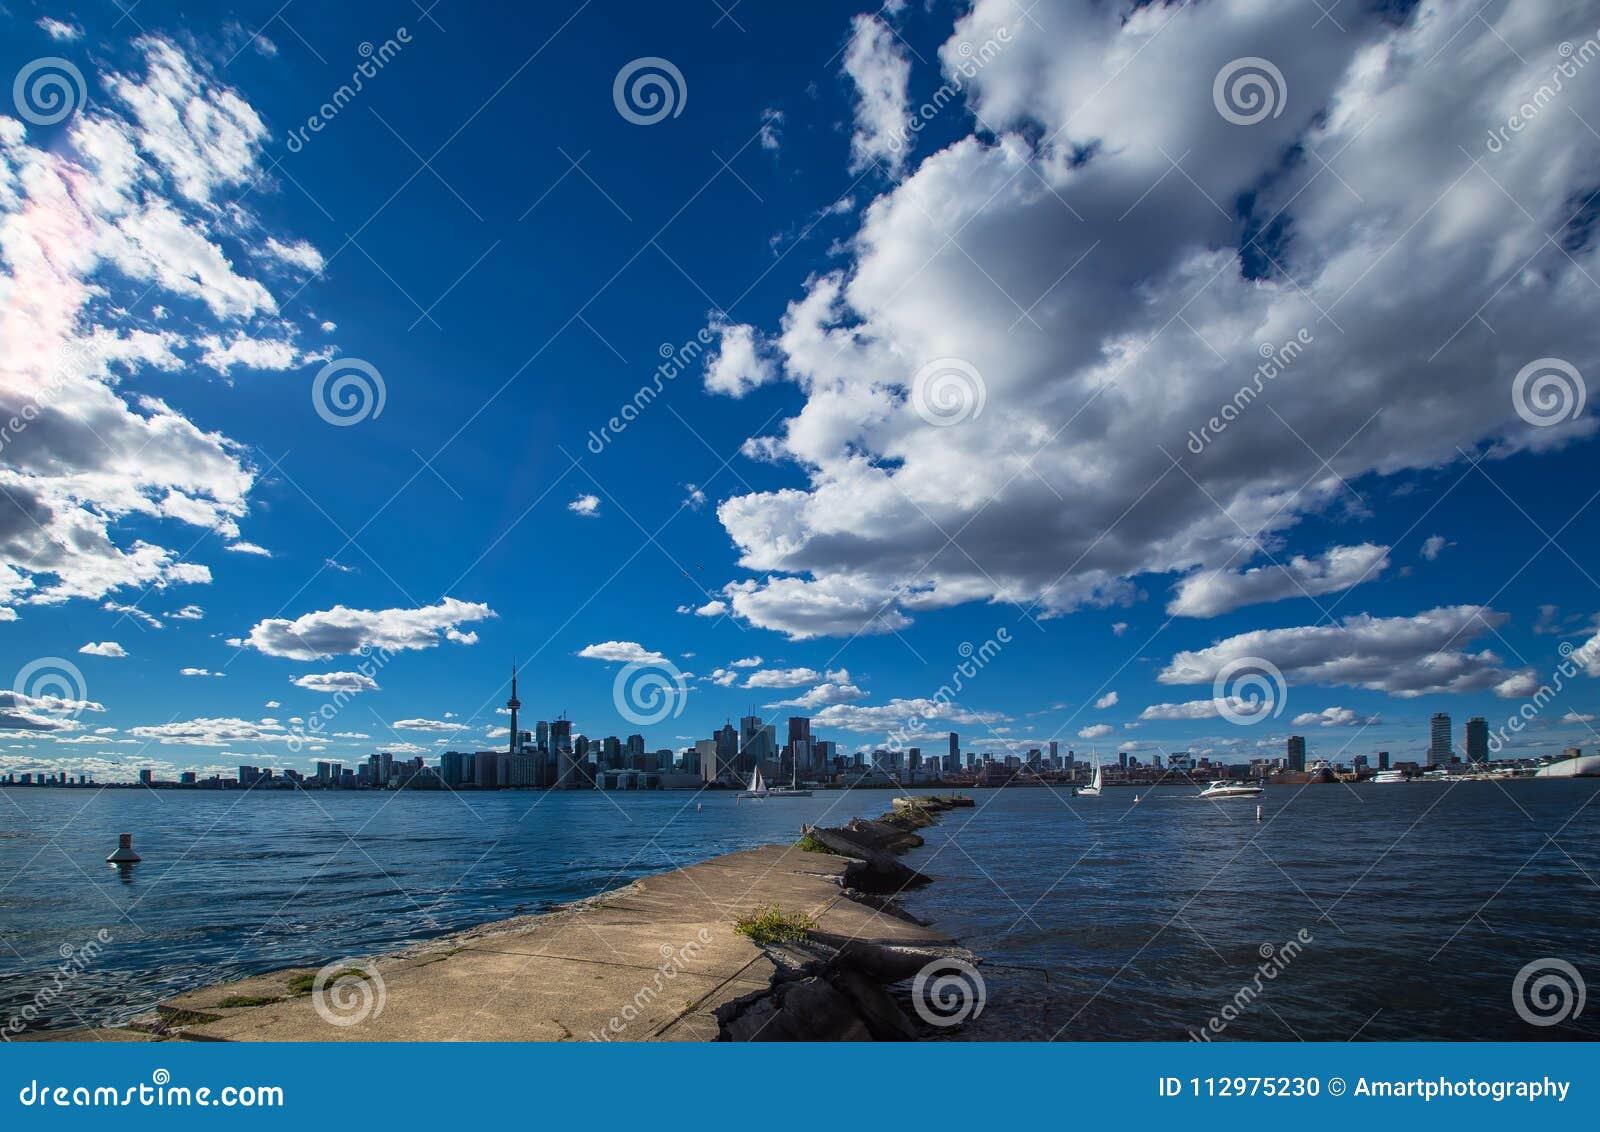 Amazing summer view of City of Toronto Ontario Canada